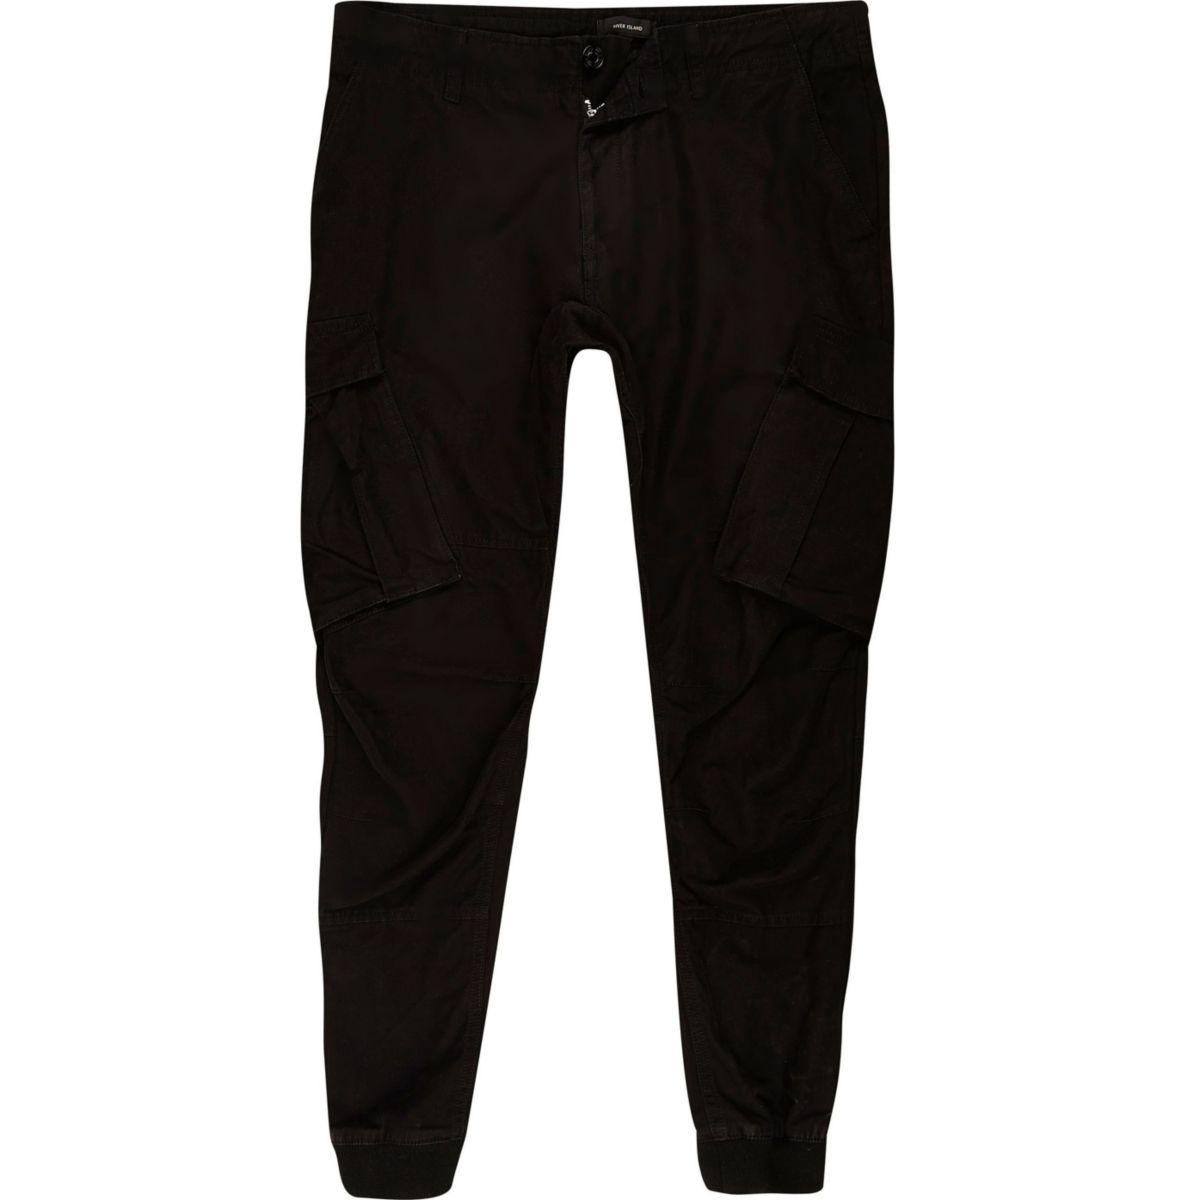 Big and Tall – Pantalon de jogging cargo fuselé noir